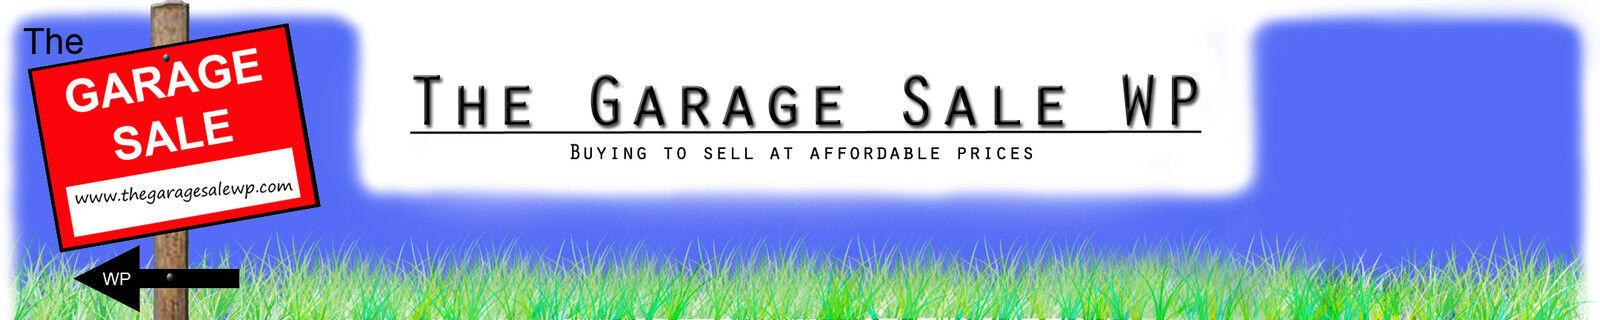 The Garage Sale WP